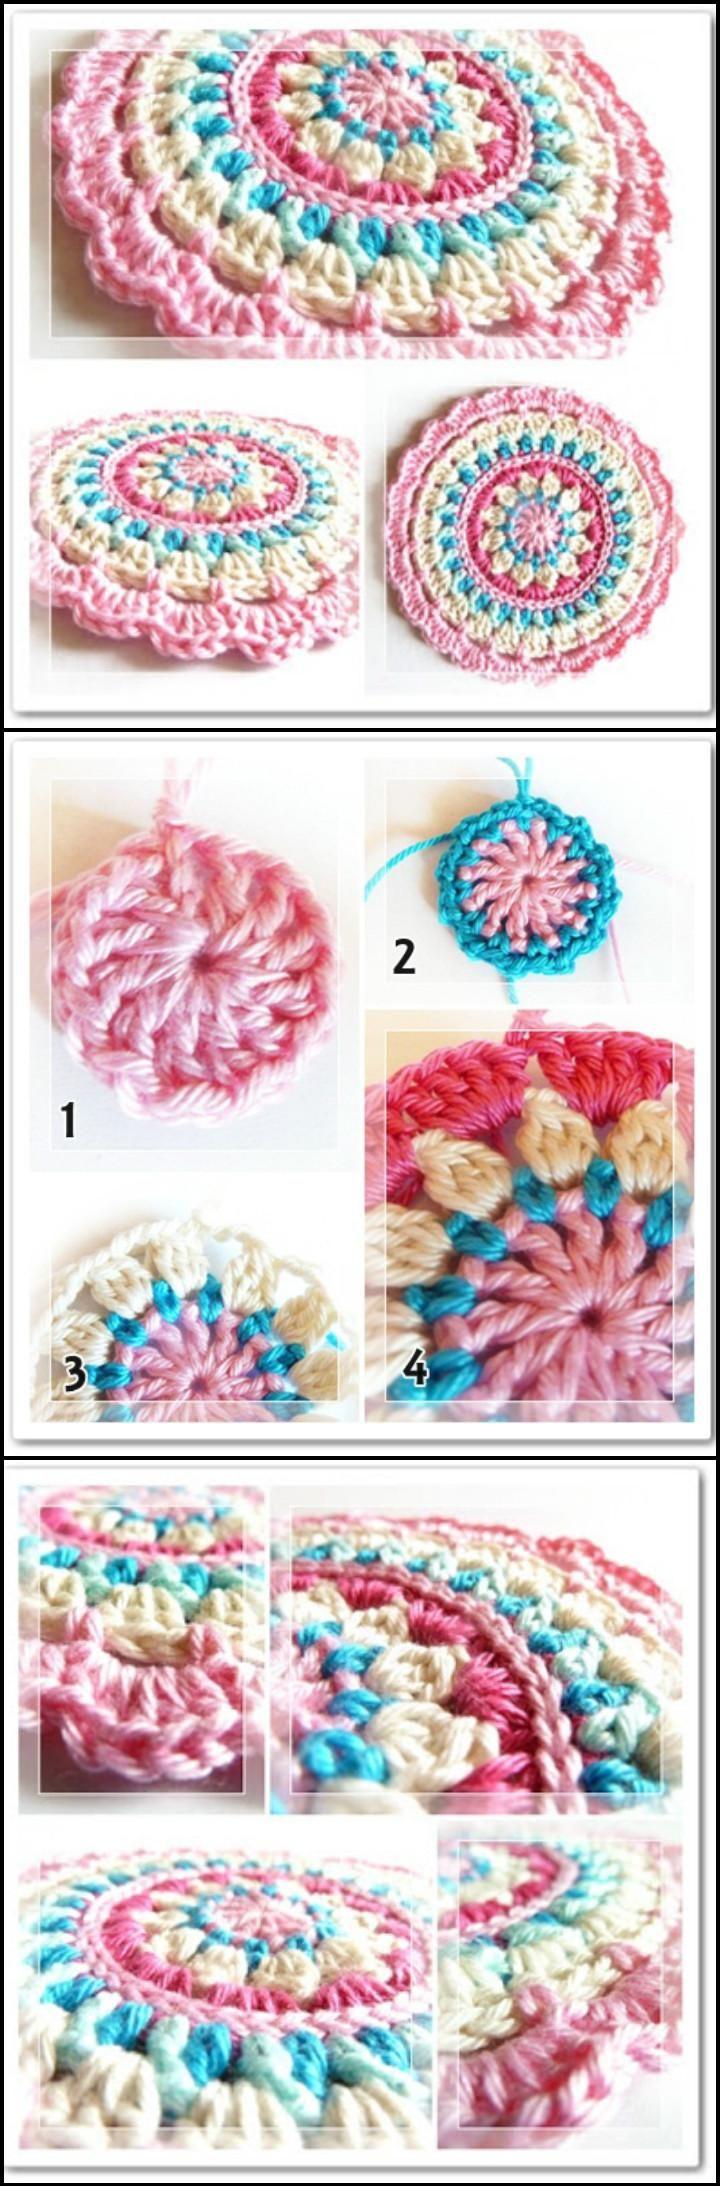 Crochet Little Spring Mandala - 60+ Free Crochet Mandala Patterns - Page 2 of 12 - DIY & Crafts